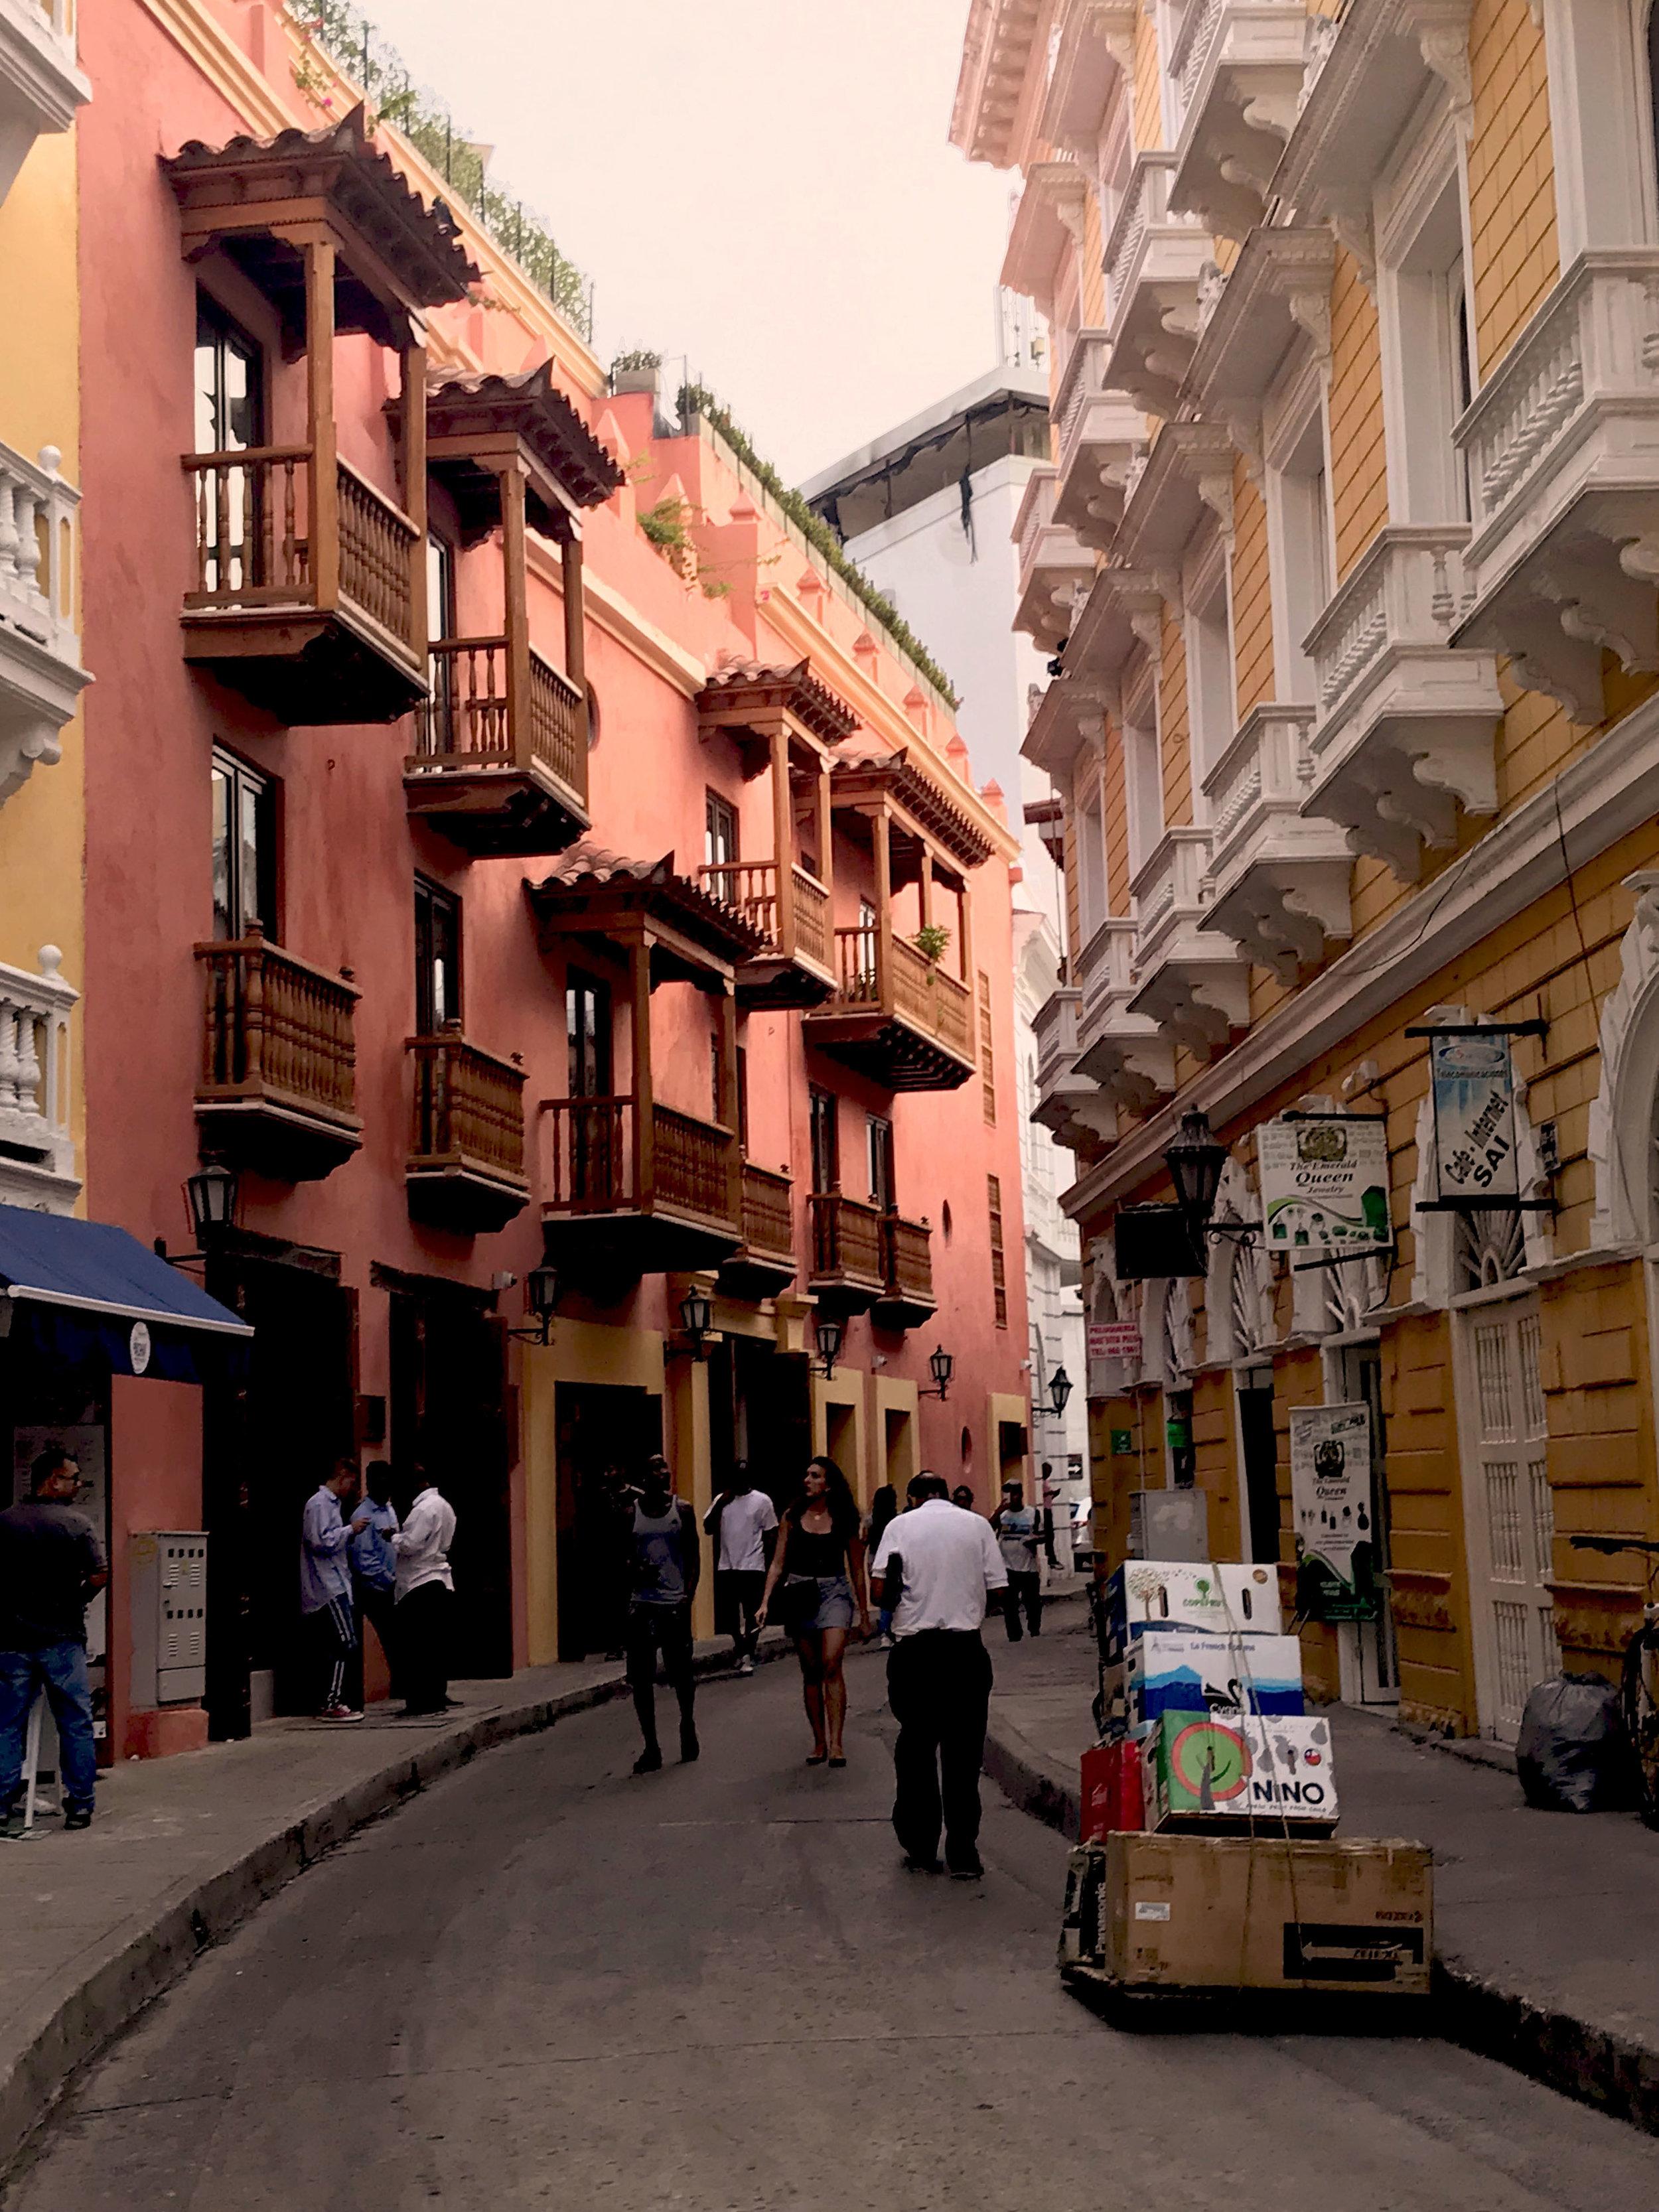 Cartagena April 2019.jpg